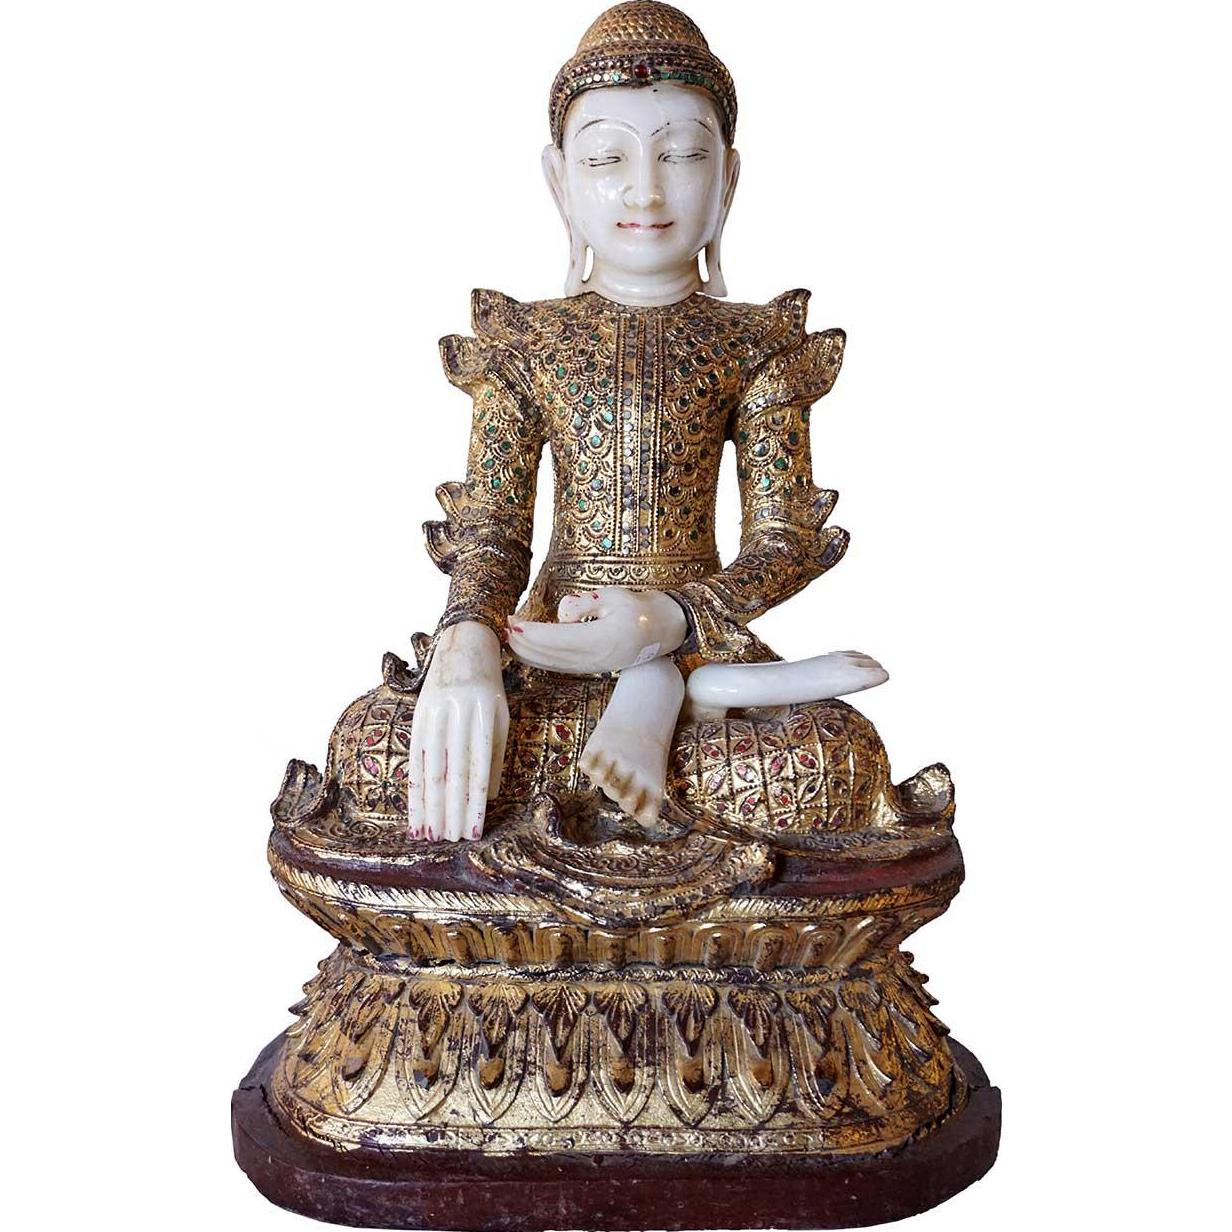 Vintage Burmese Mandalay Gilt Wood, Glass Inlaid and Alabaster Seated Buddha Statue